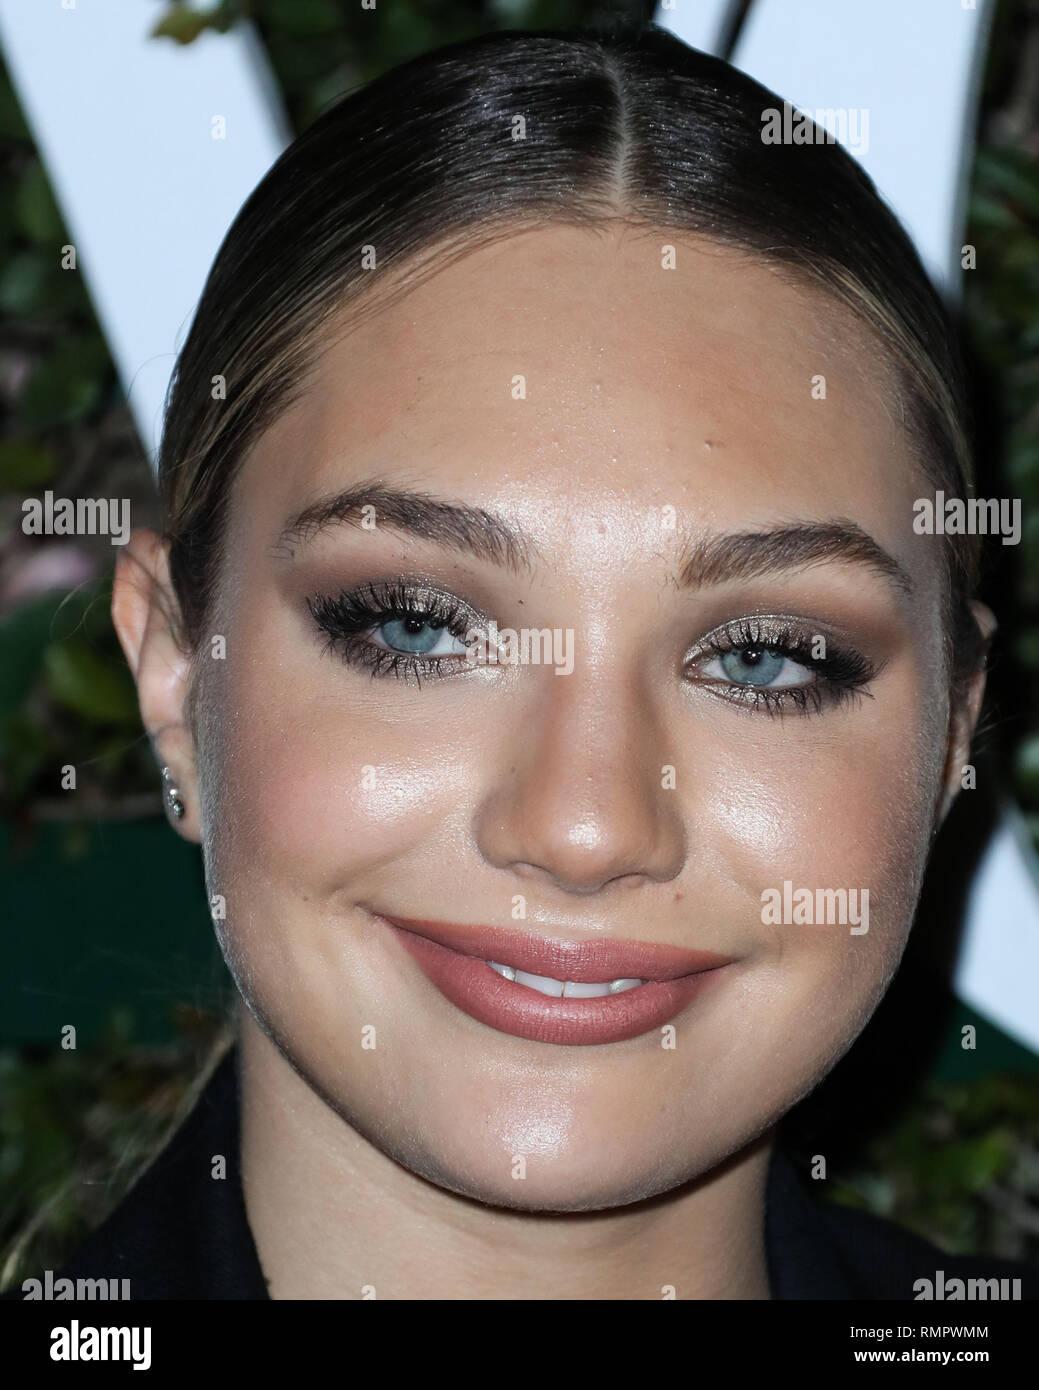 LOS ANGELES, CA, USA - FEBRUARY 15: Actress Maddie Ziegler